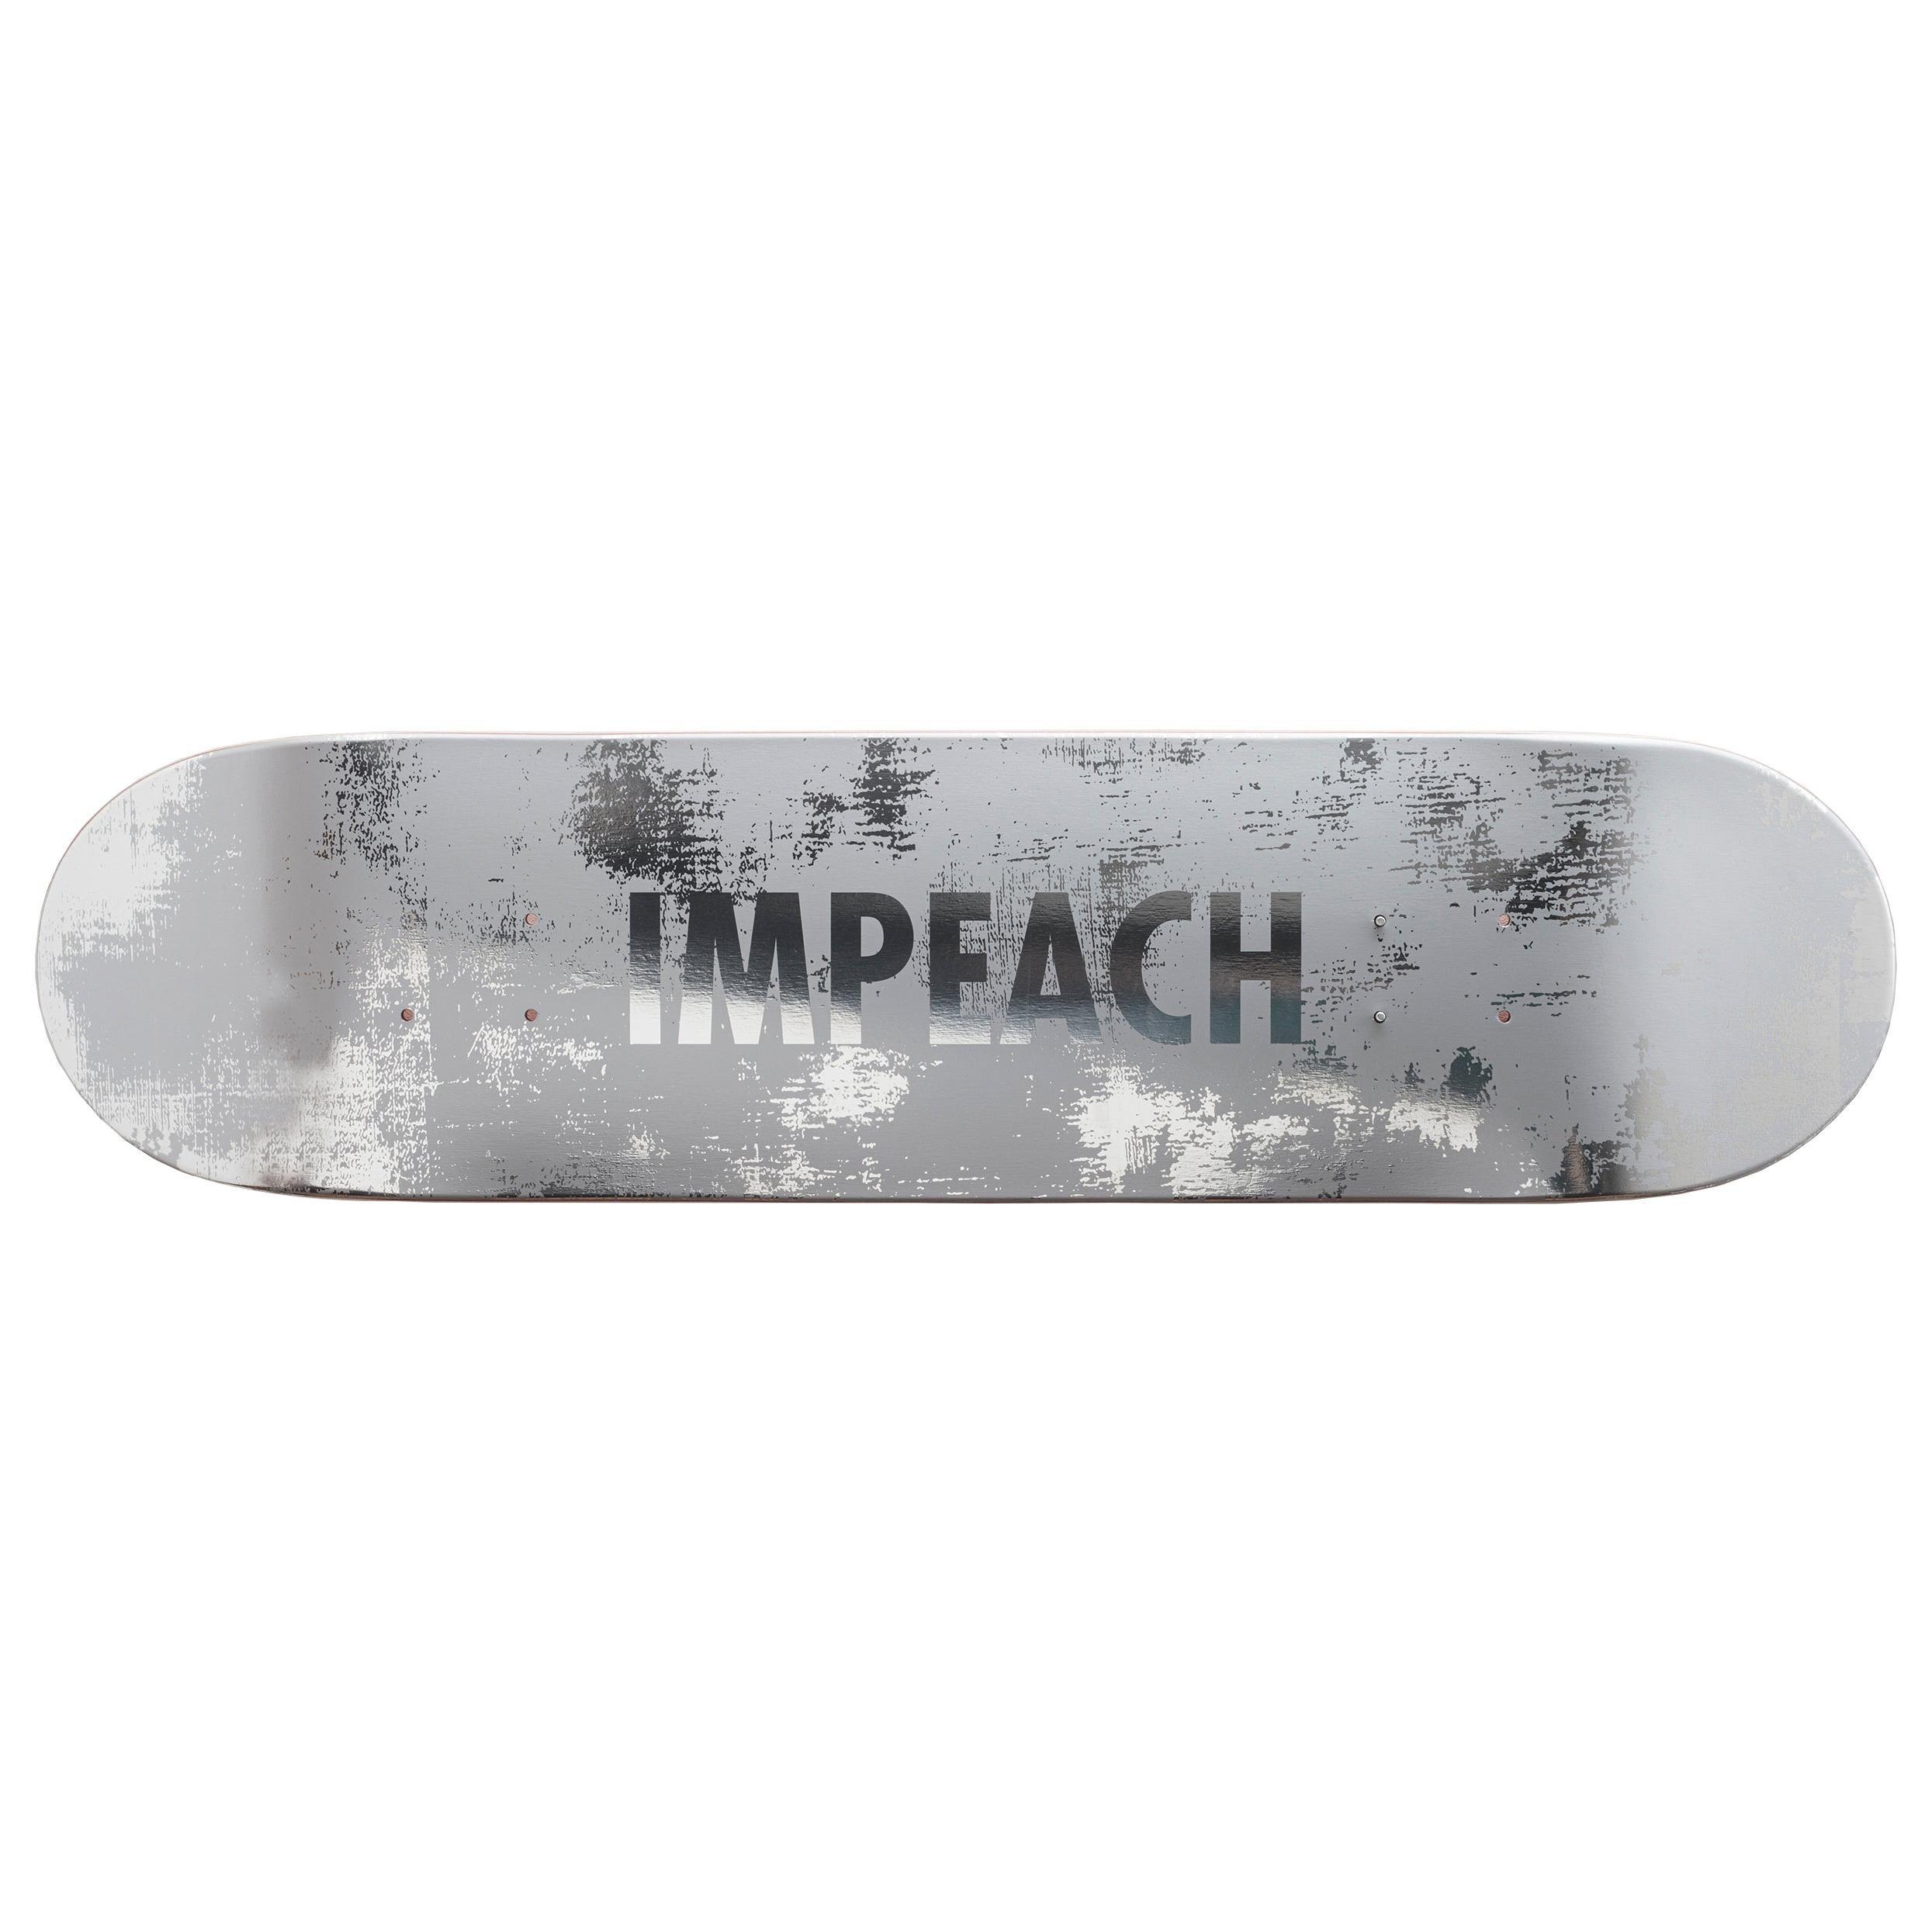 Impeach 'Wood' Skateboard Deck by Jenny Holzer